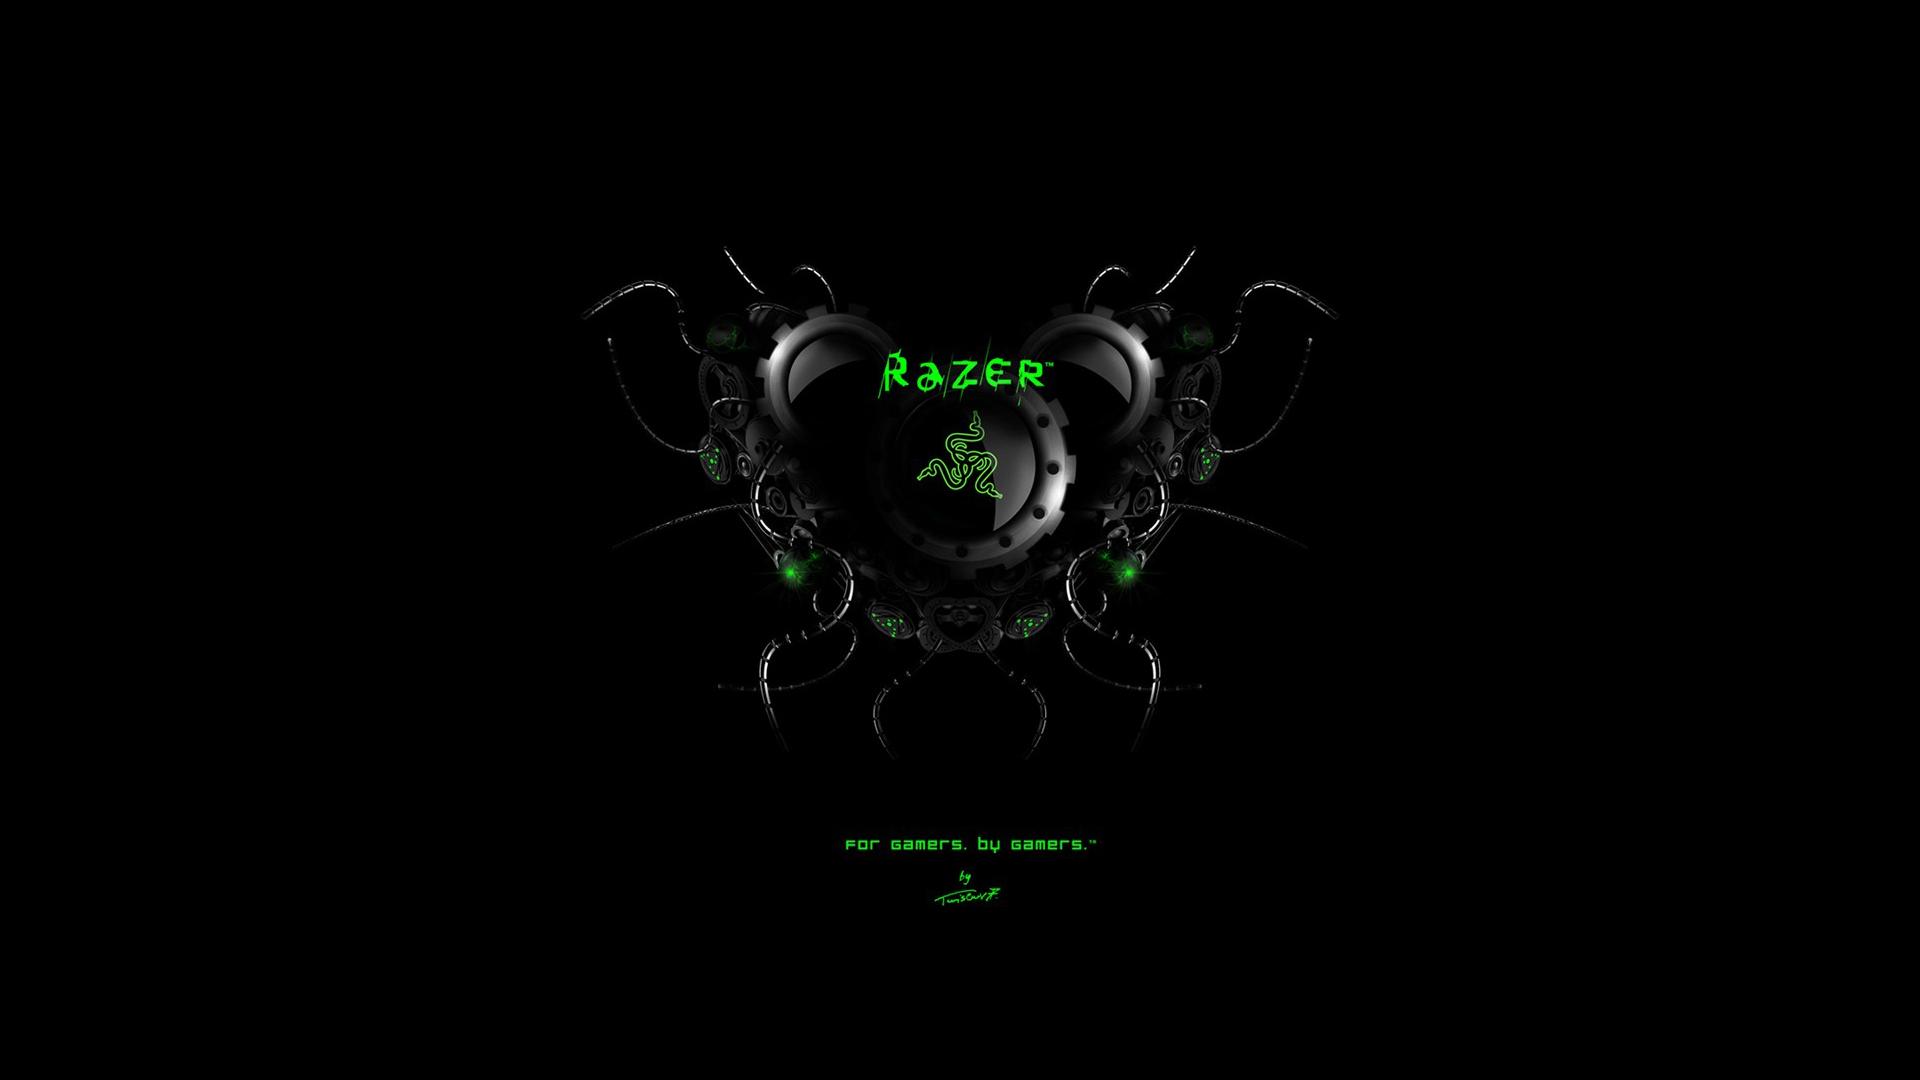 razer logo black background hd 1920x1080 1080p wallpaper compatible 1920x1080